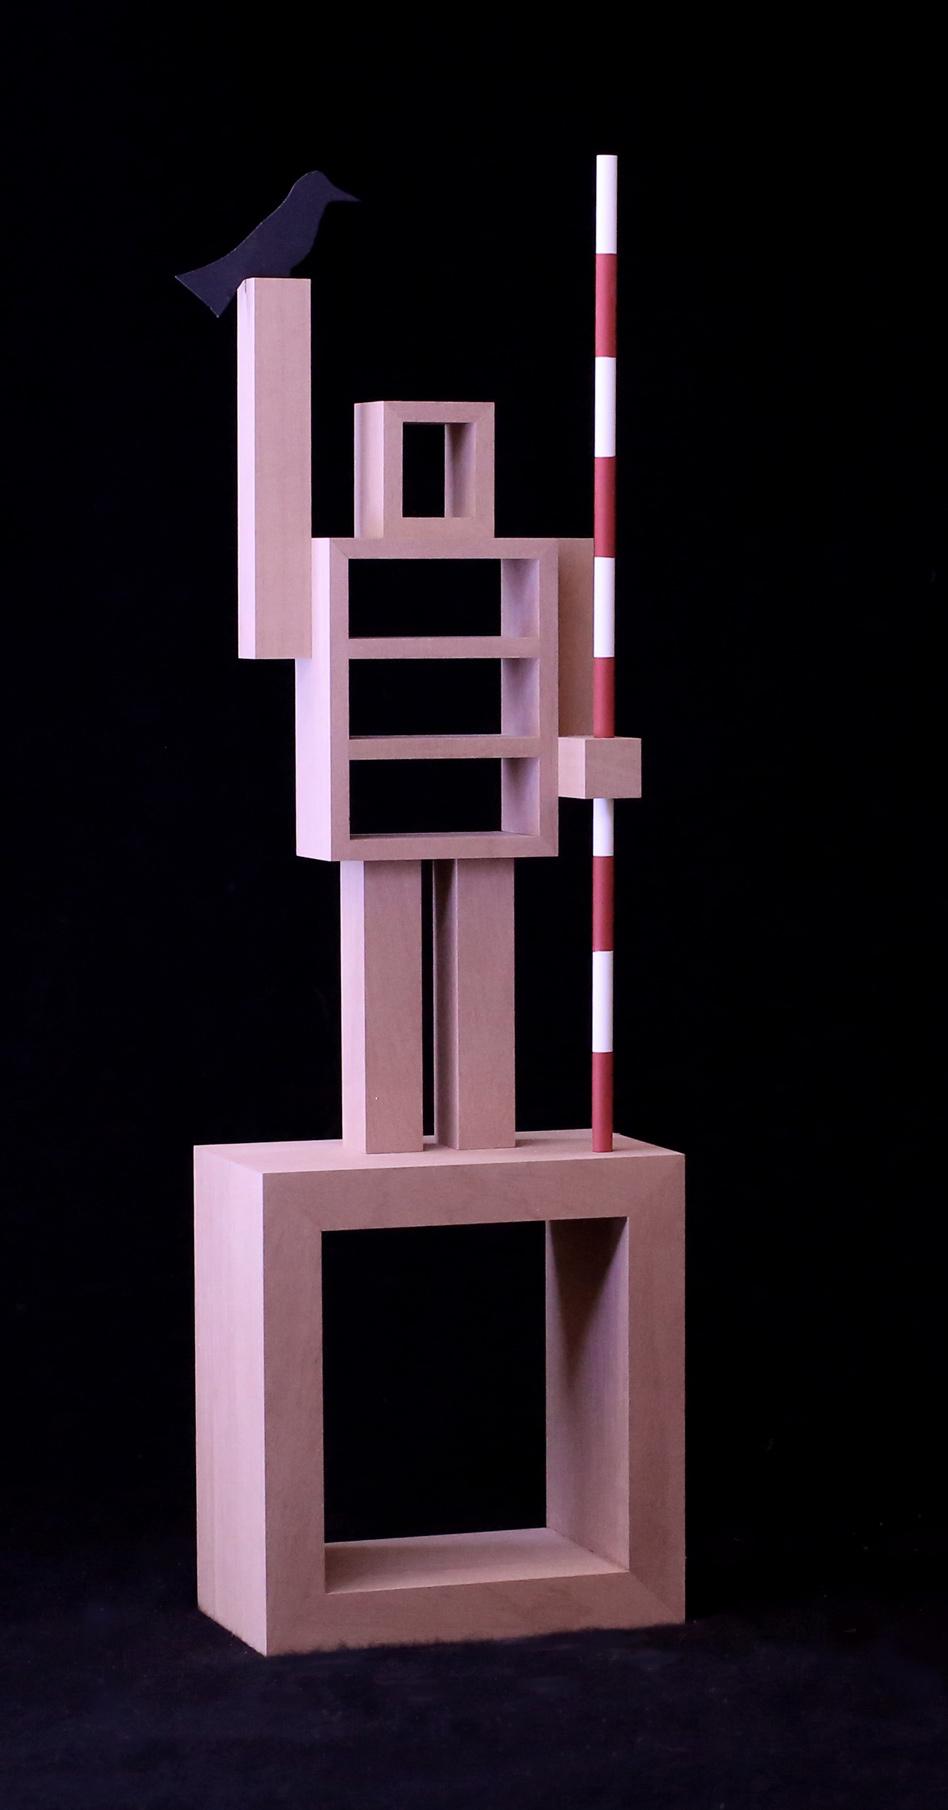 Robert u.Trix Haussmann, Uomo Architetto, wood, 35x12x8 cm, edition of 6